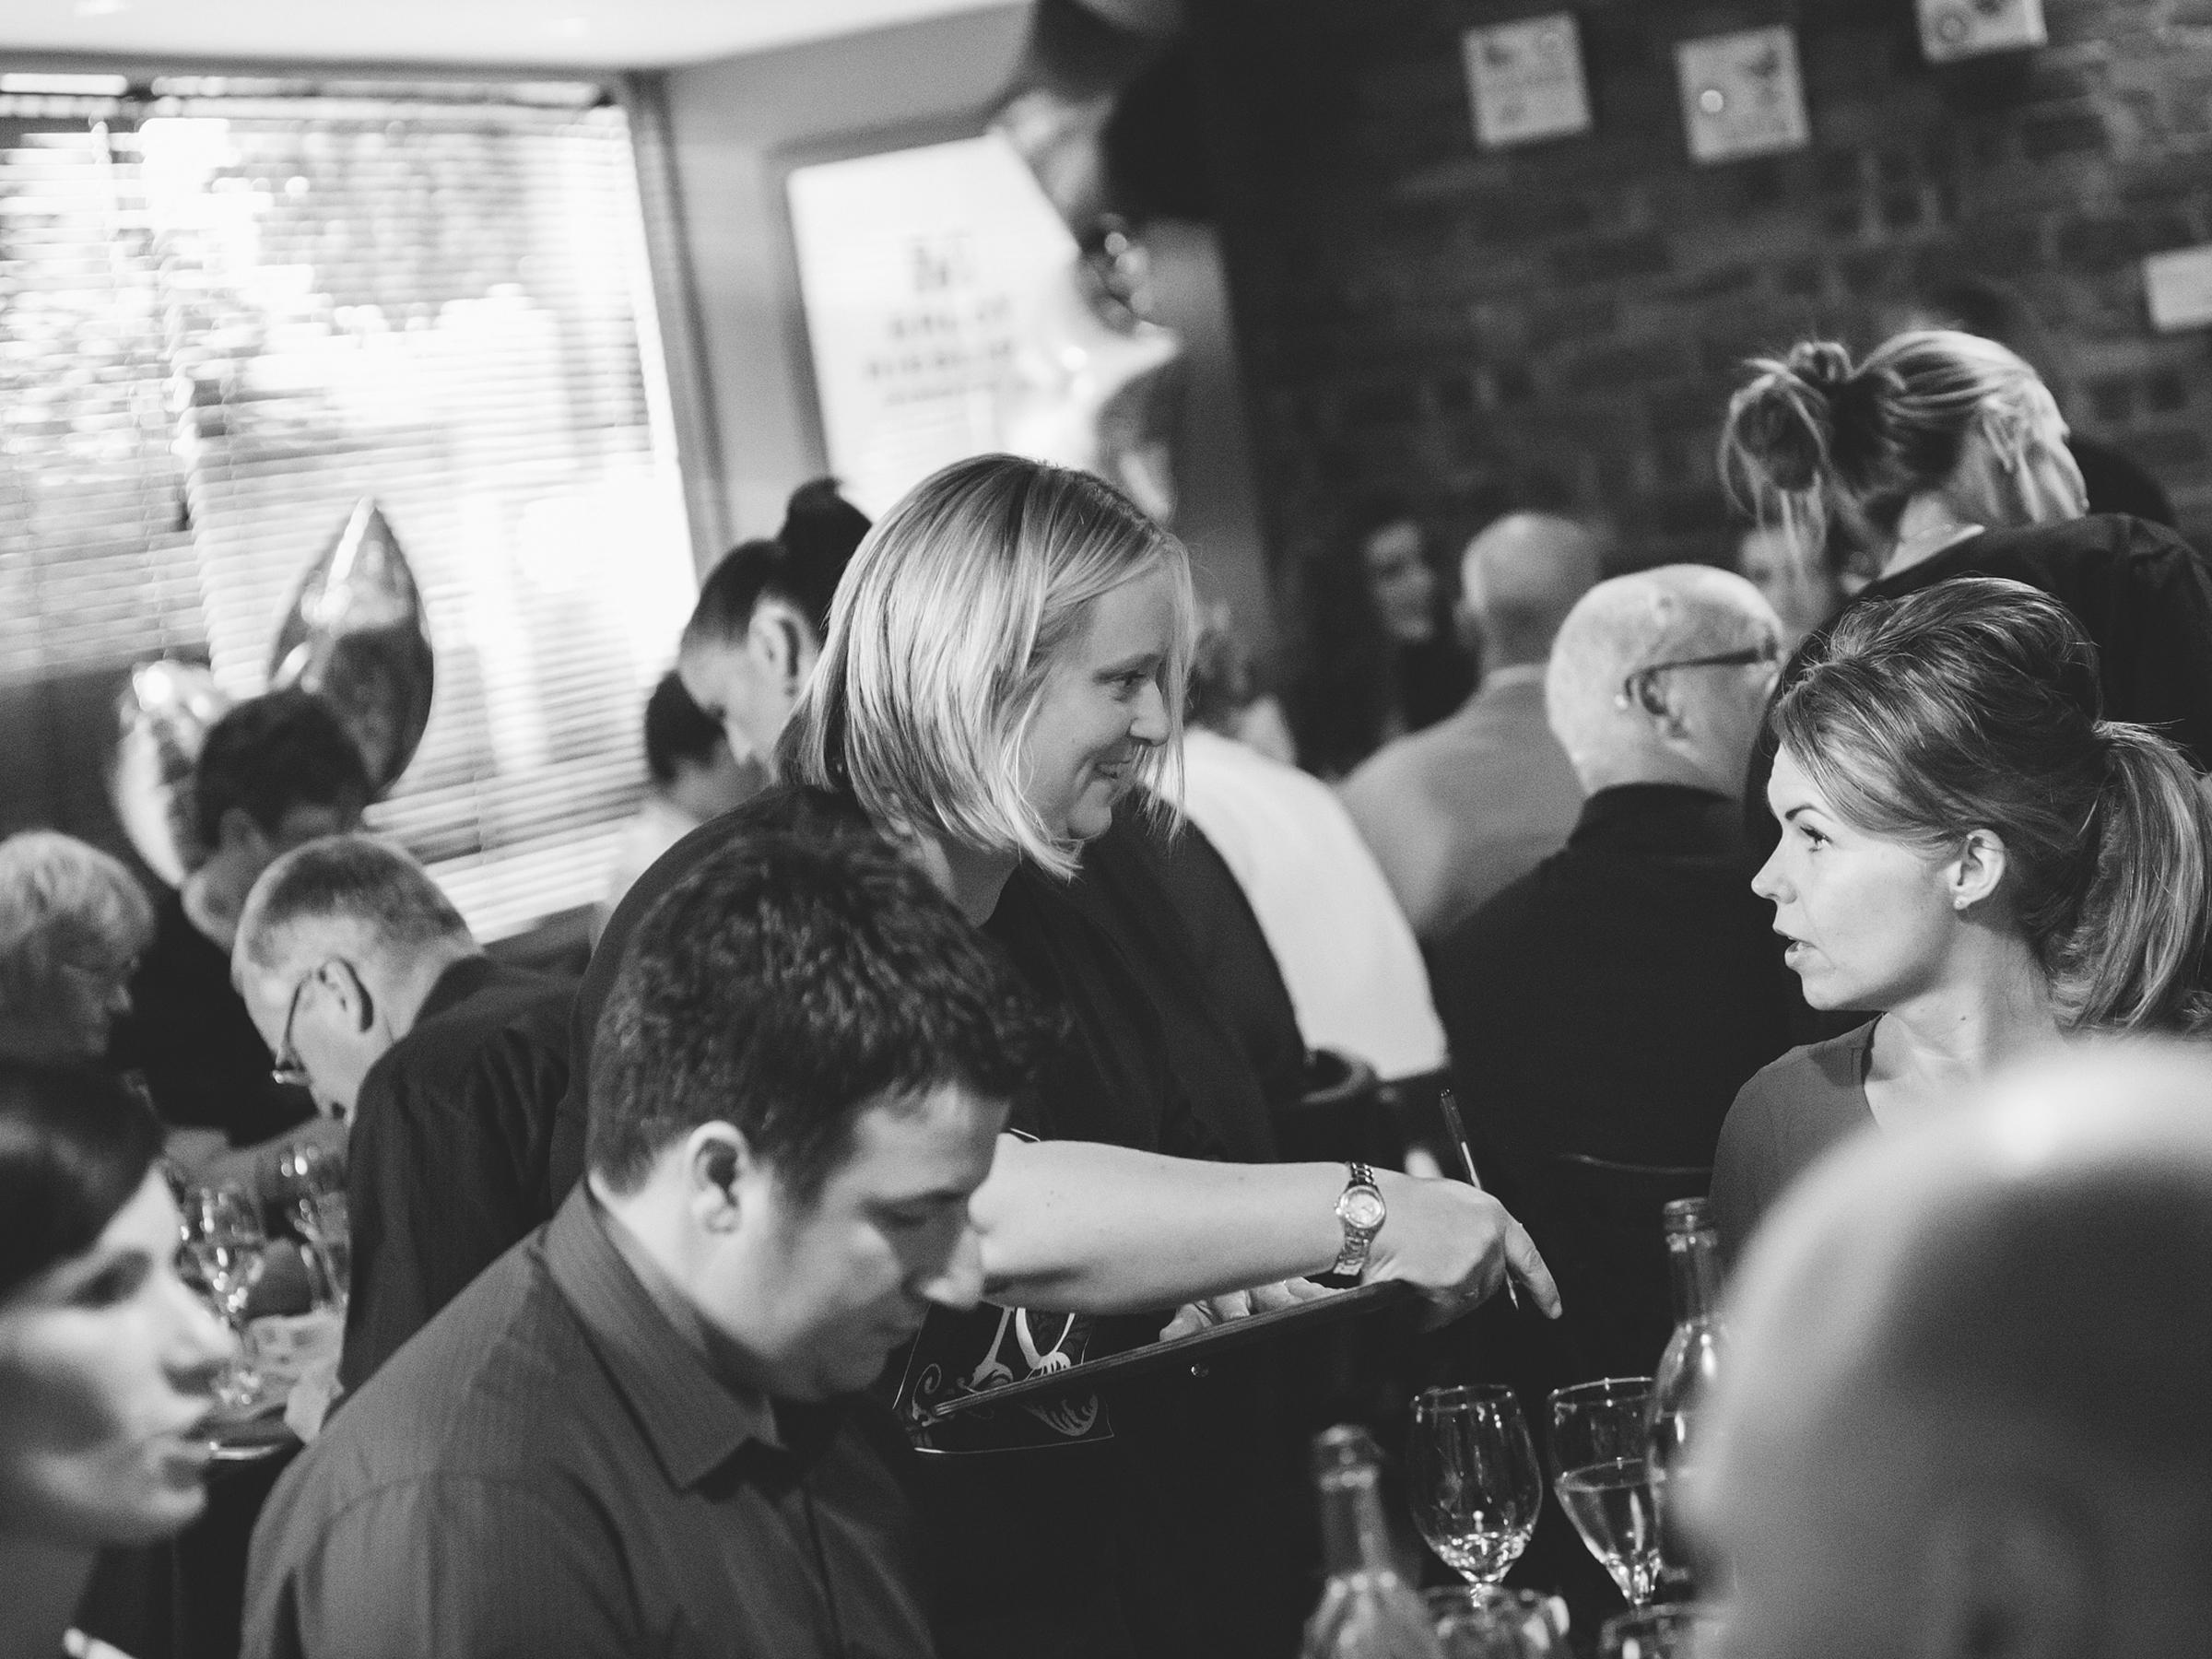 papamacs-restaurant-johnstone-service-party-night-1